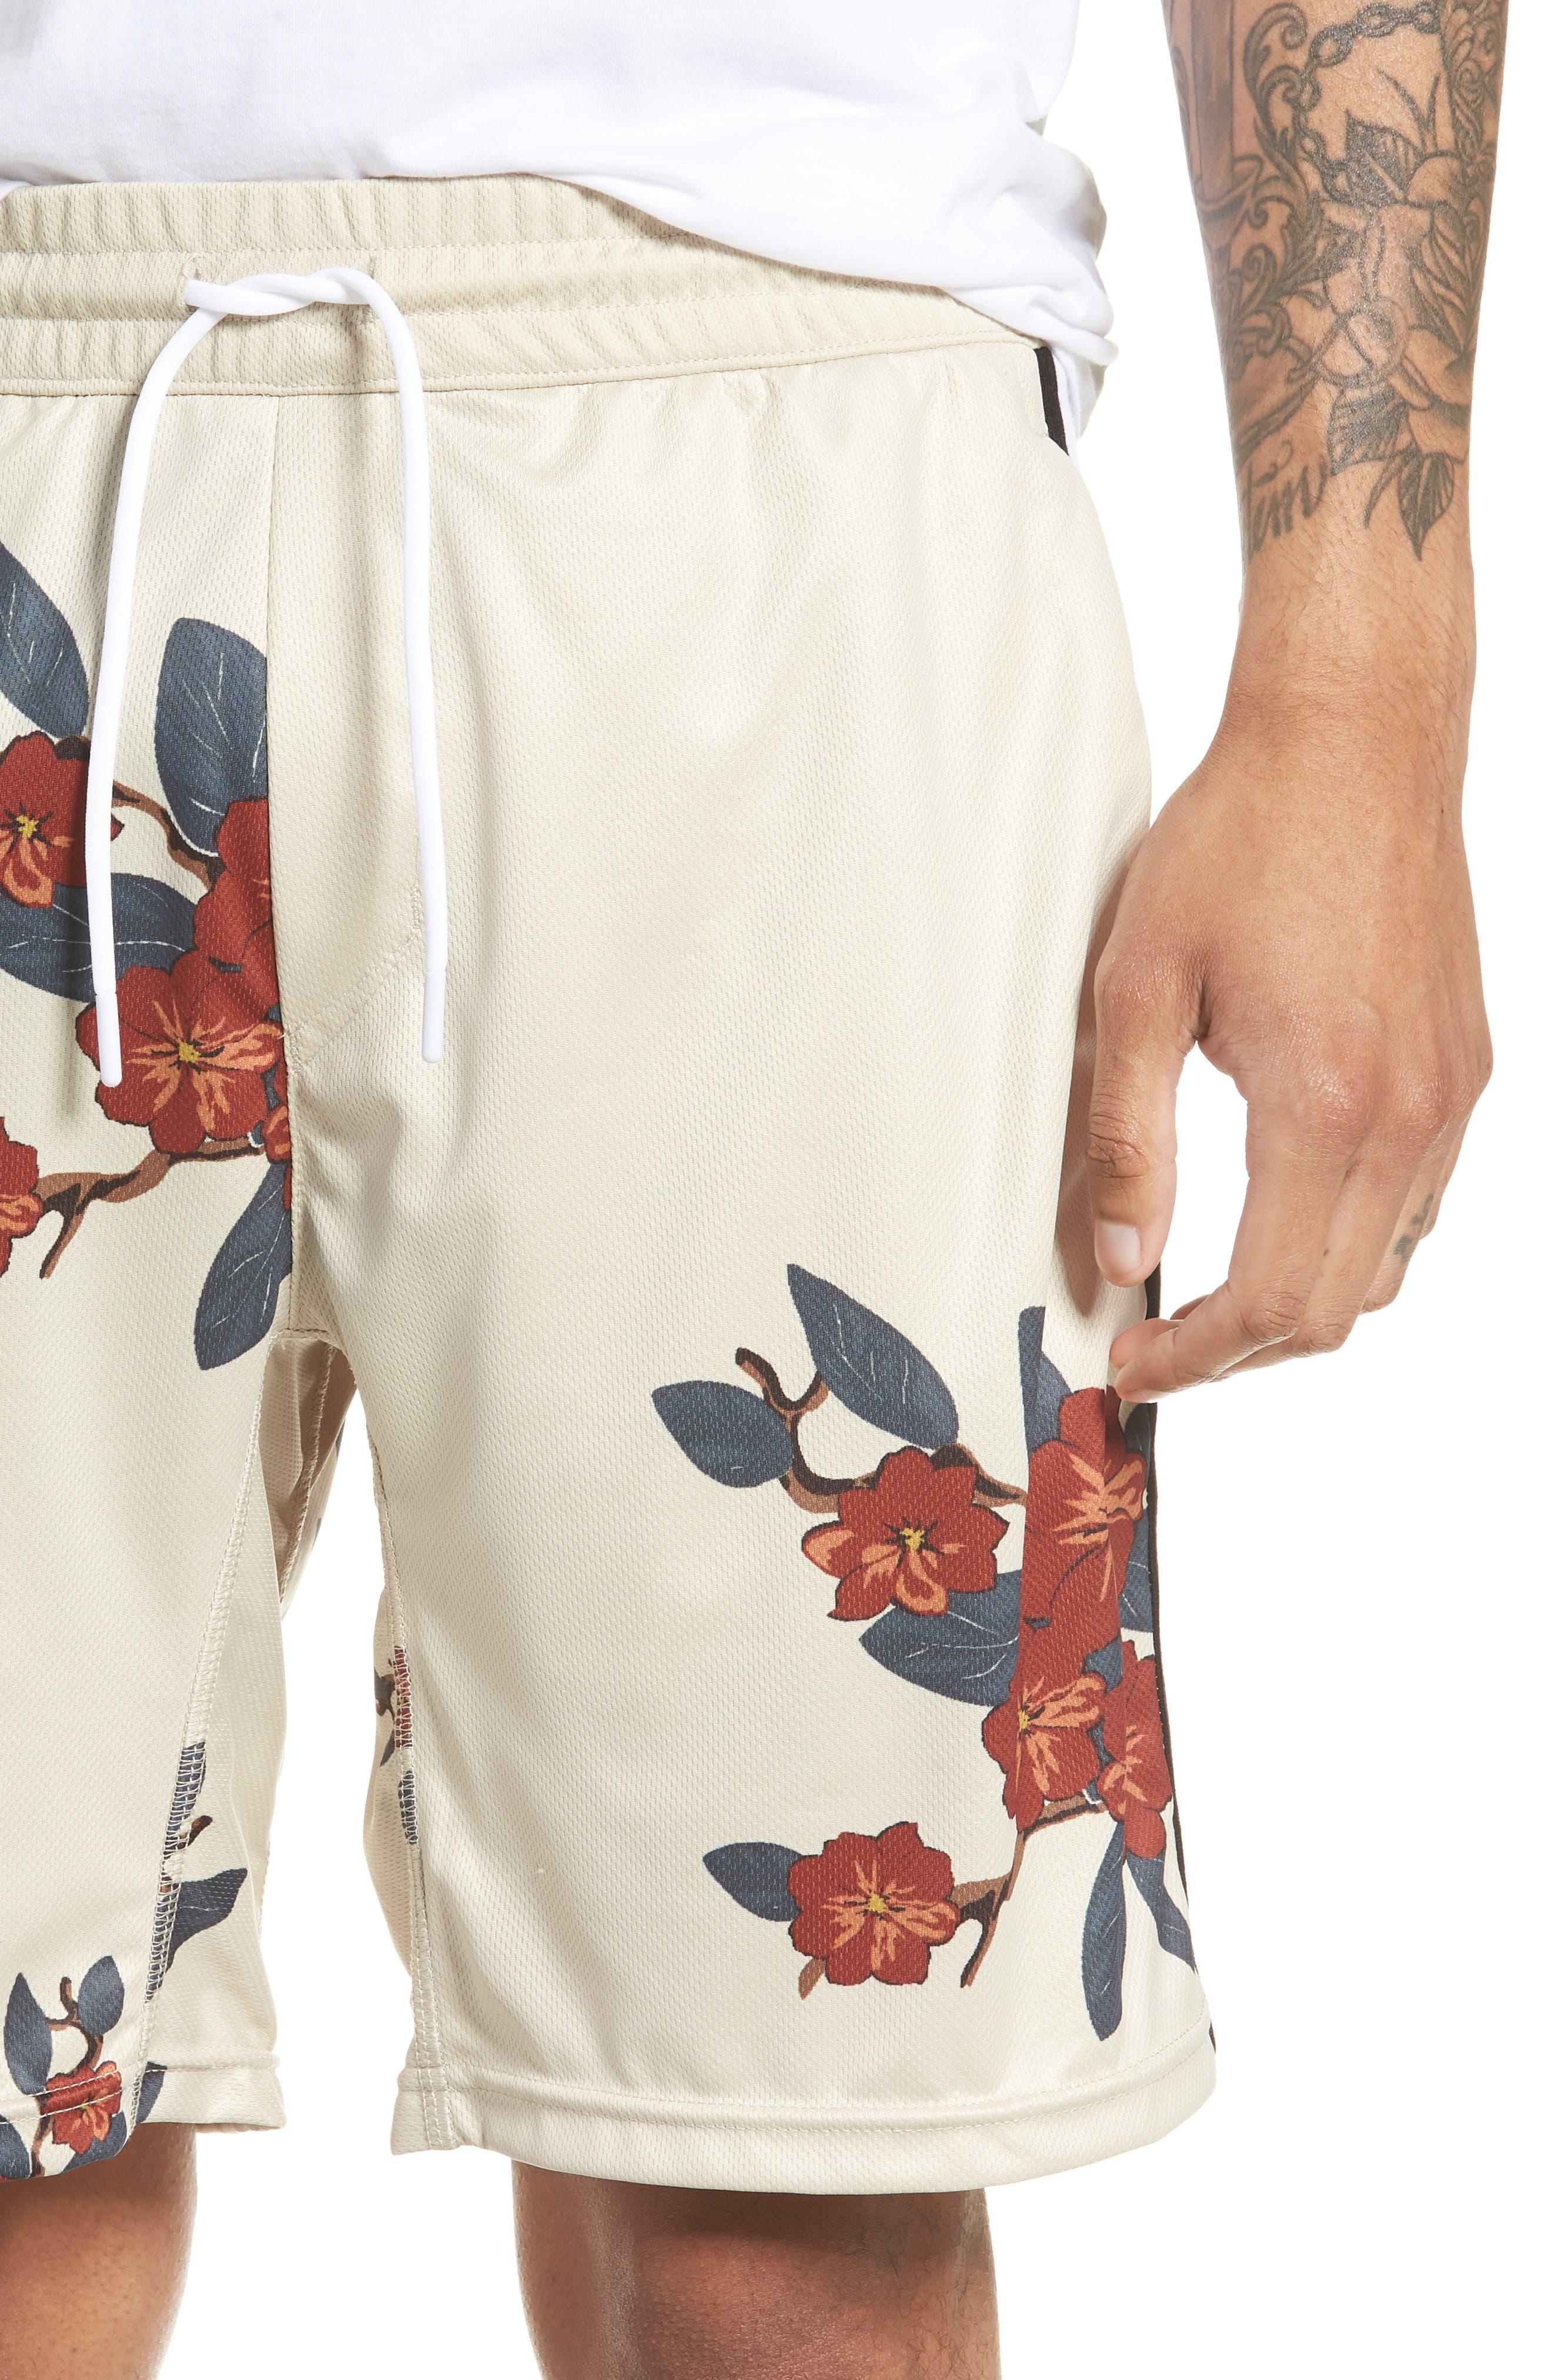 Bloom Sideline Shorts,                             Alternate thumbnail 4, color,                             901